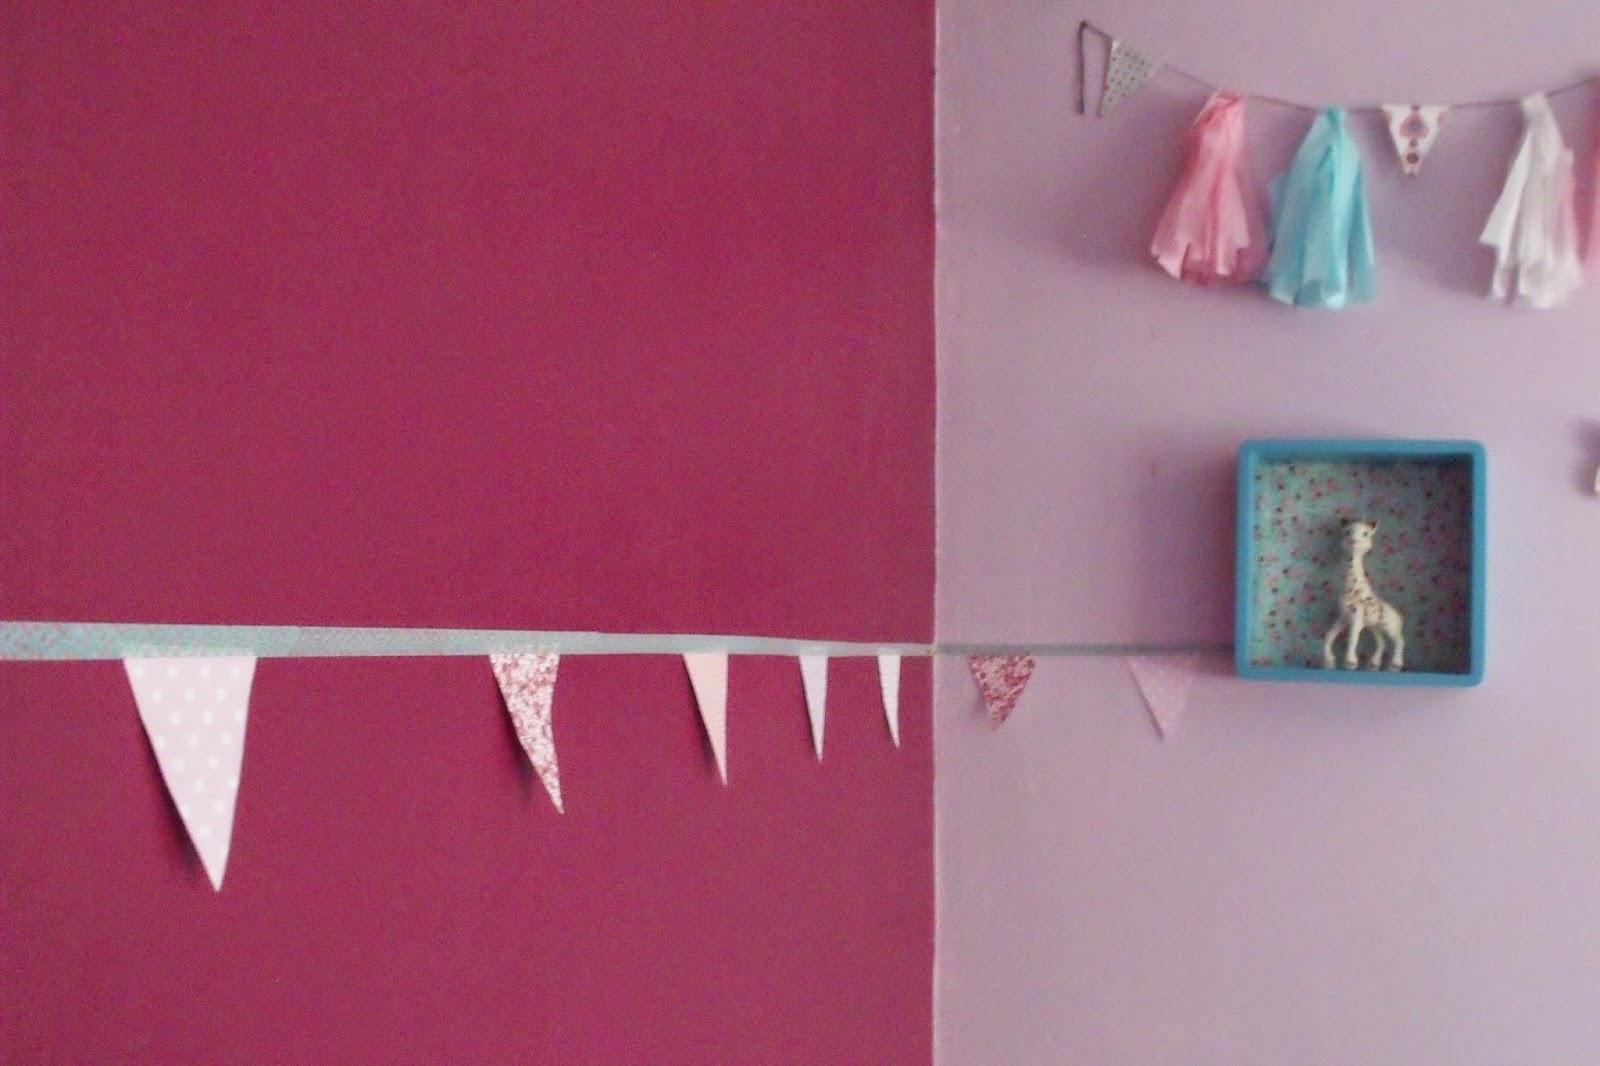 lili joue maman bricole guirlande fanions et masking tape. Black Bedroom Furniture Sets. Home Design Ideas